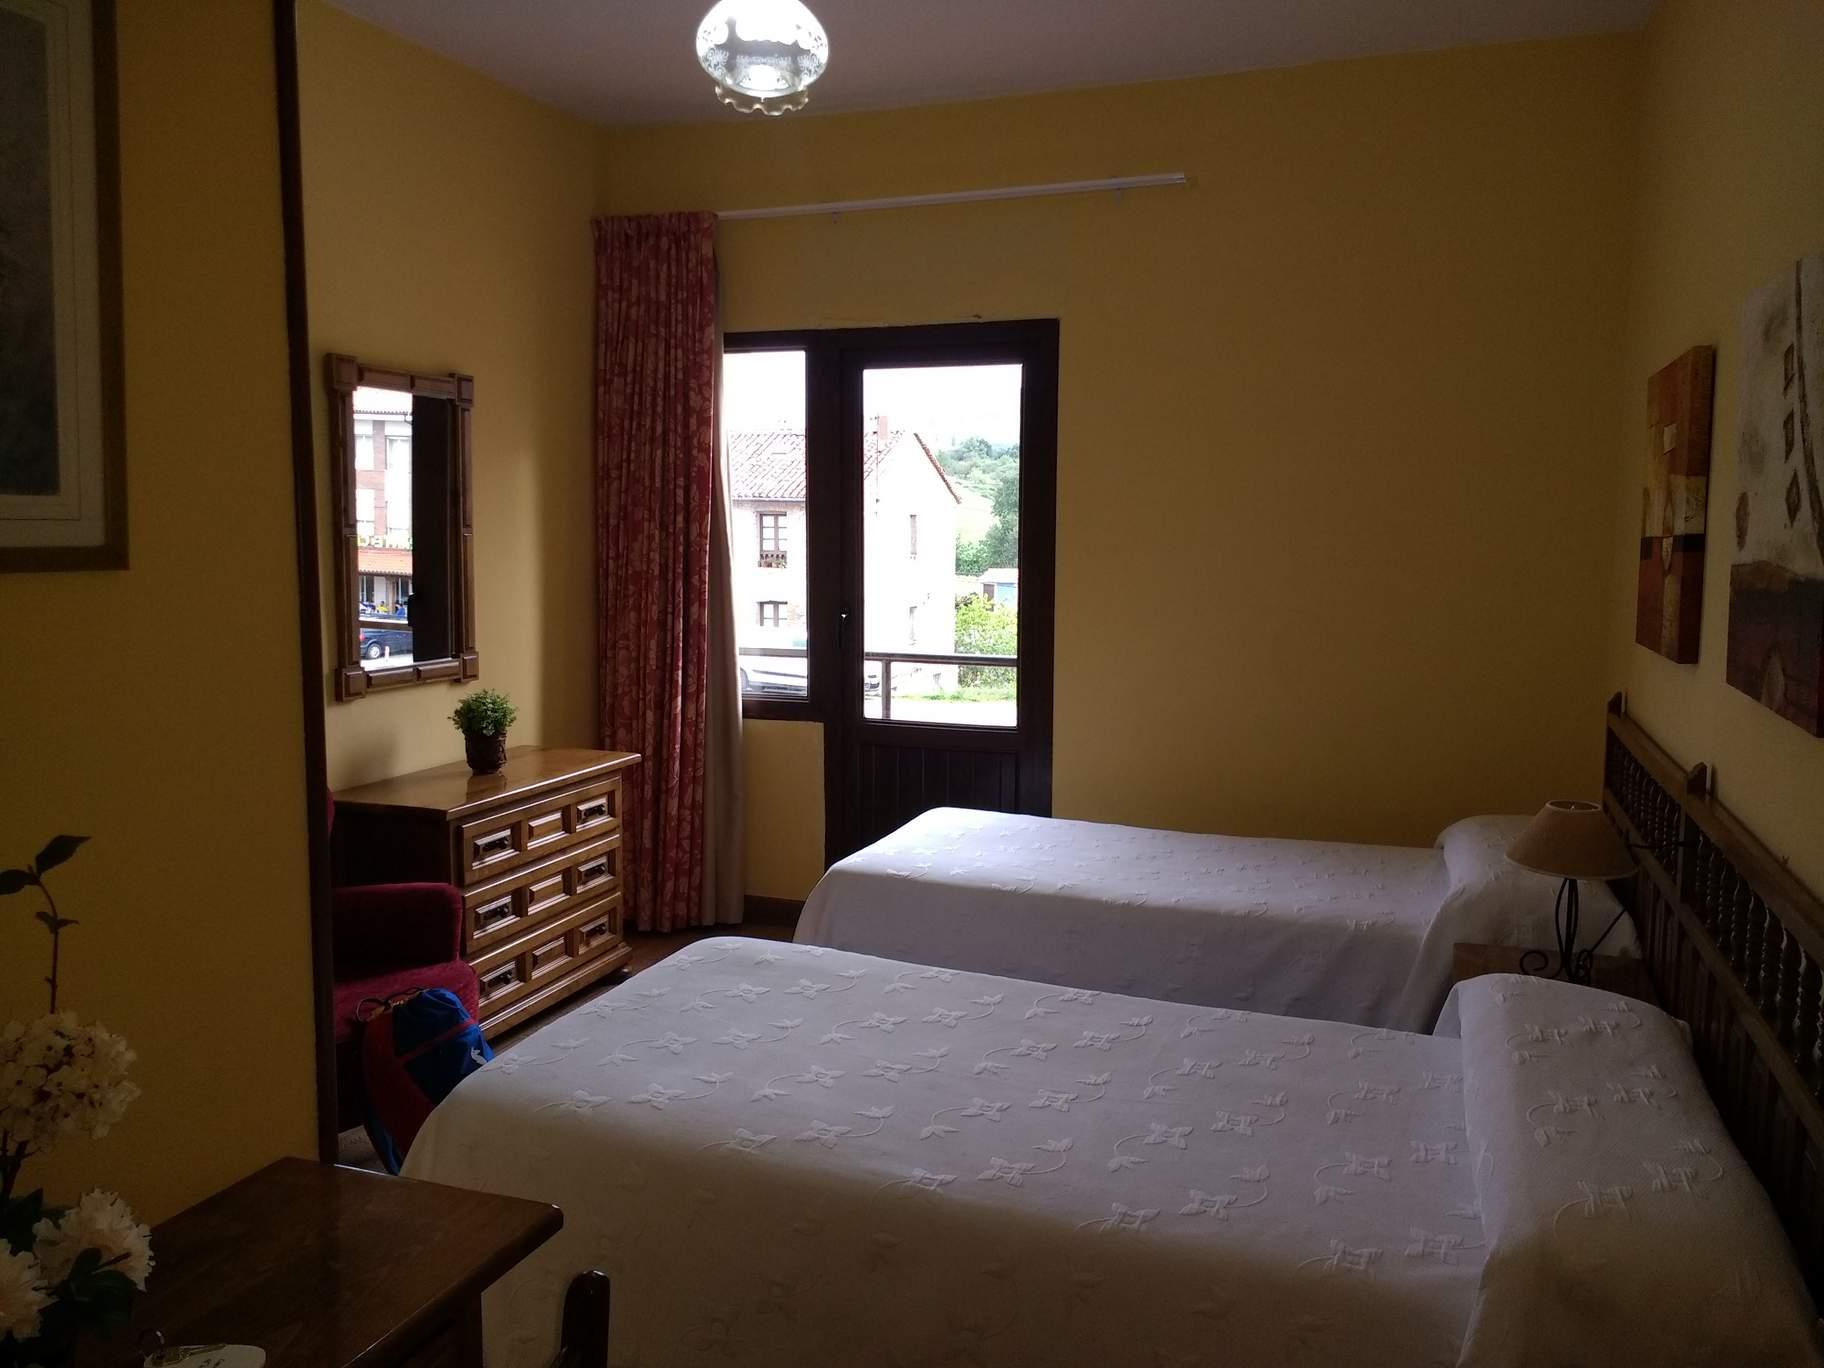 Cancel Hotel Room Hotwire Trip Insurance